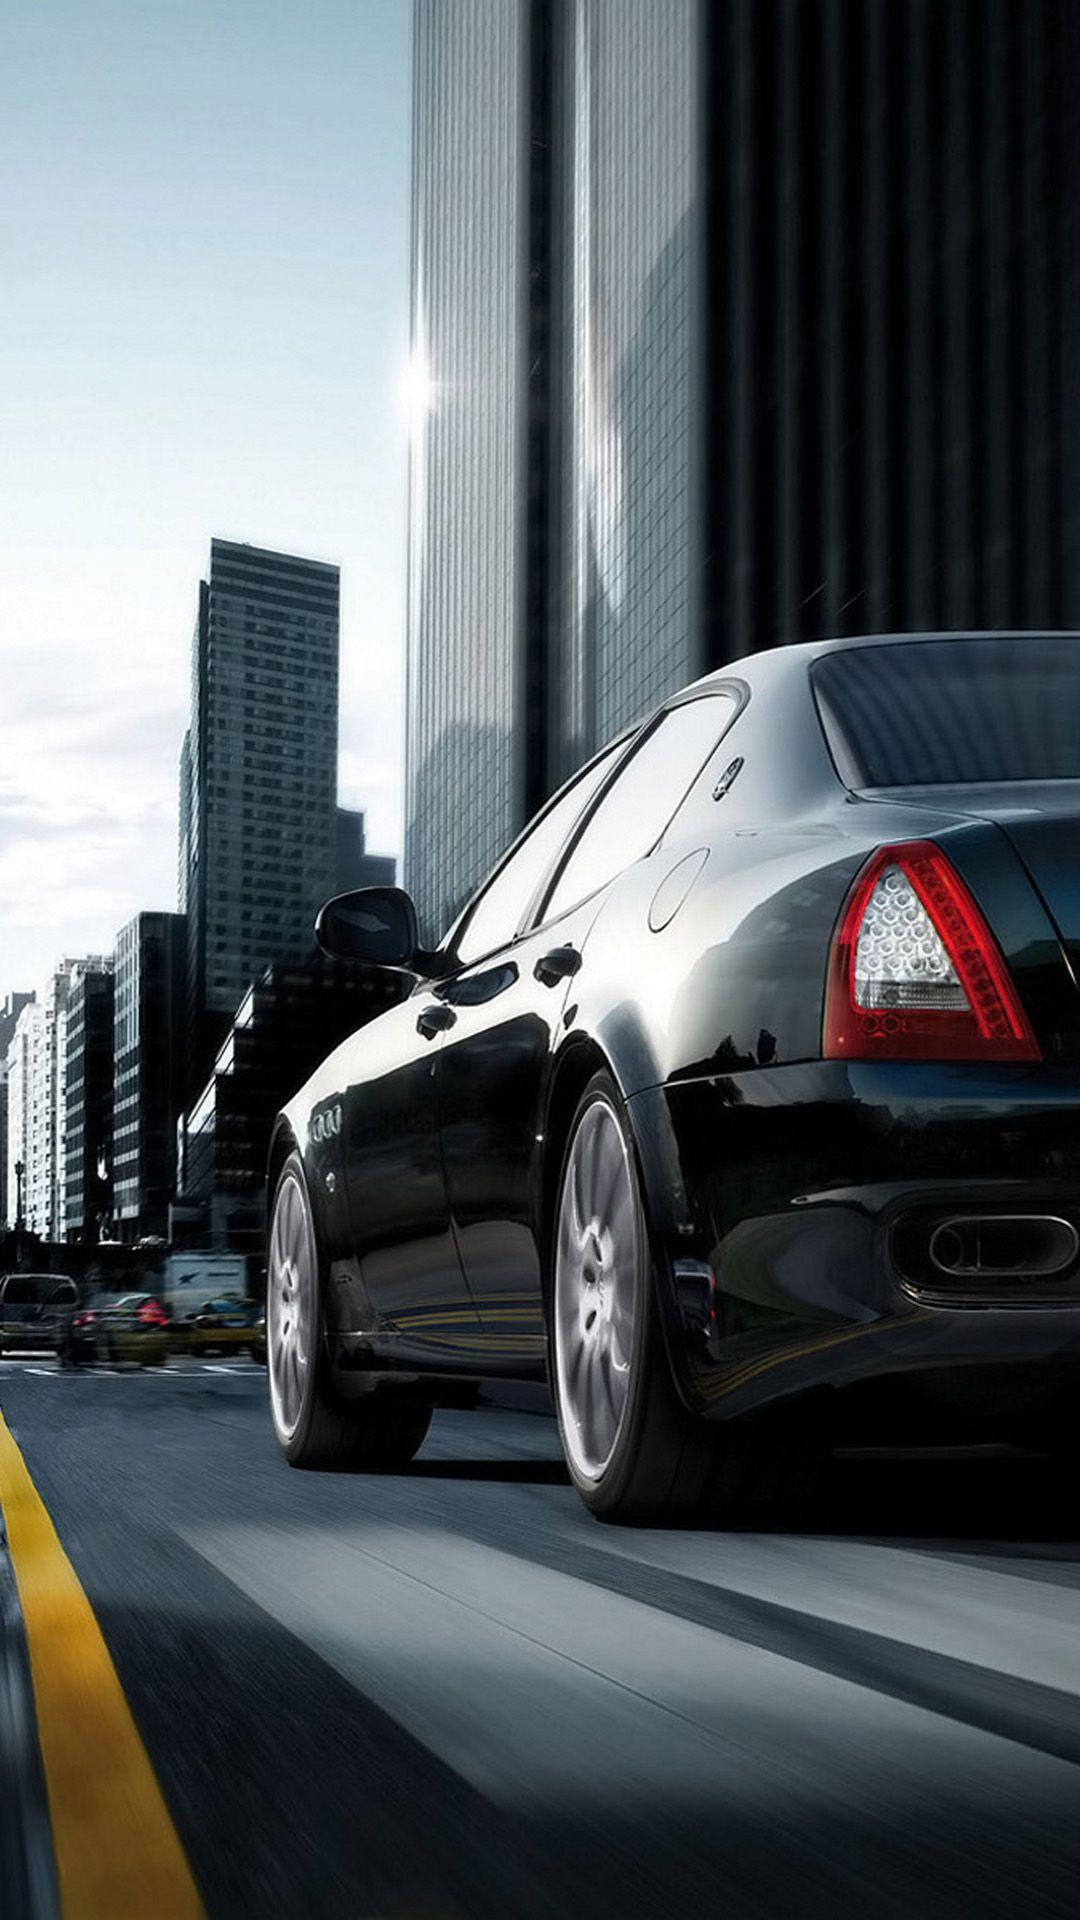 Maserati Quattroporte Black Cars Motorcycles Pinterest